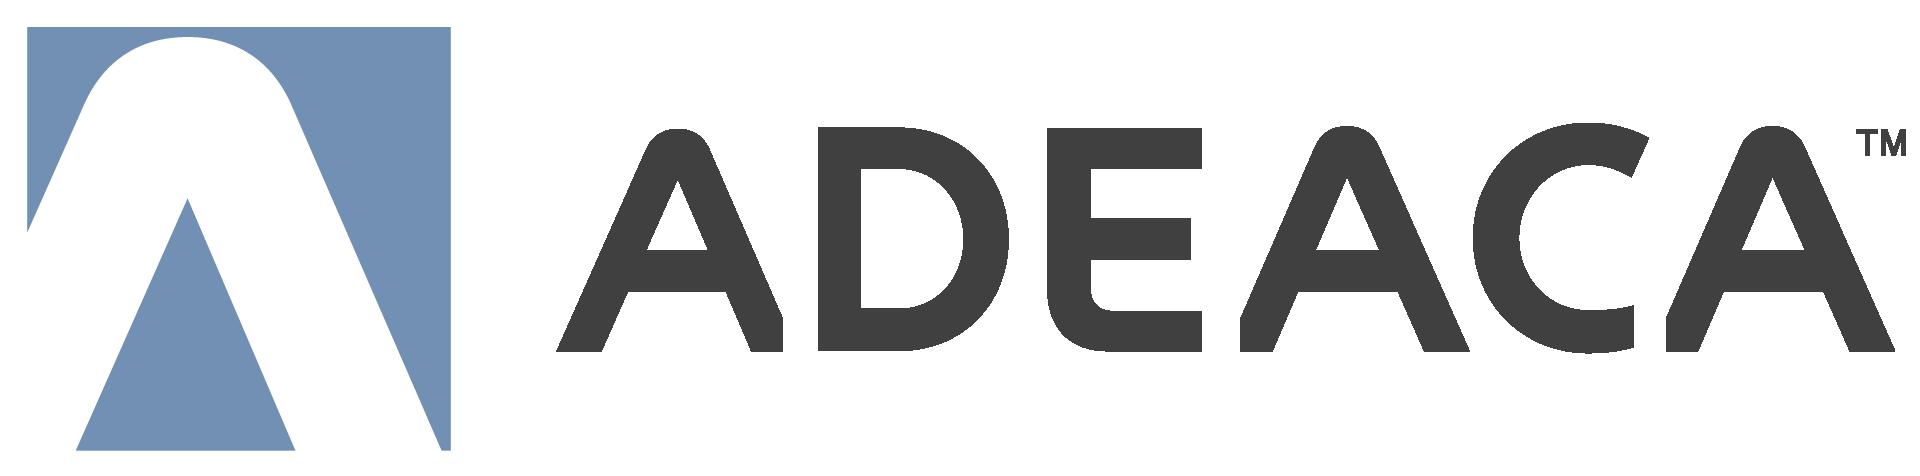 Matt Mong of Adeaca Takes Deep Dive into PBA in Modern Contractor Solutions